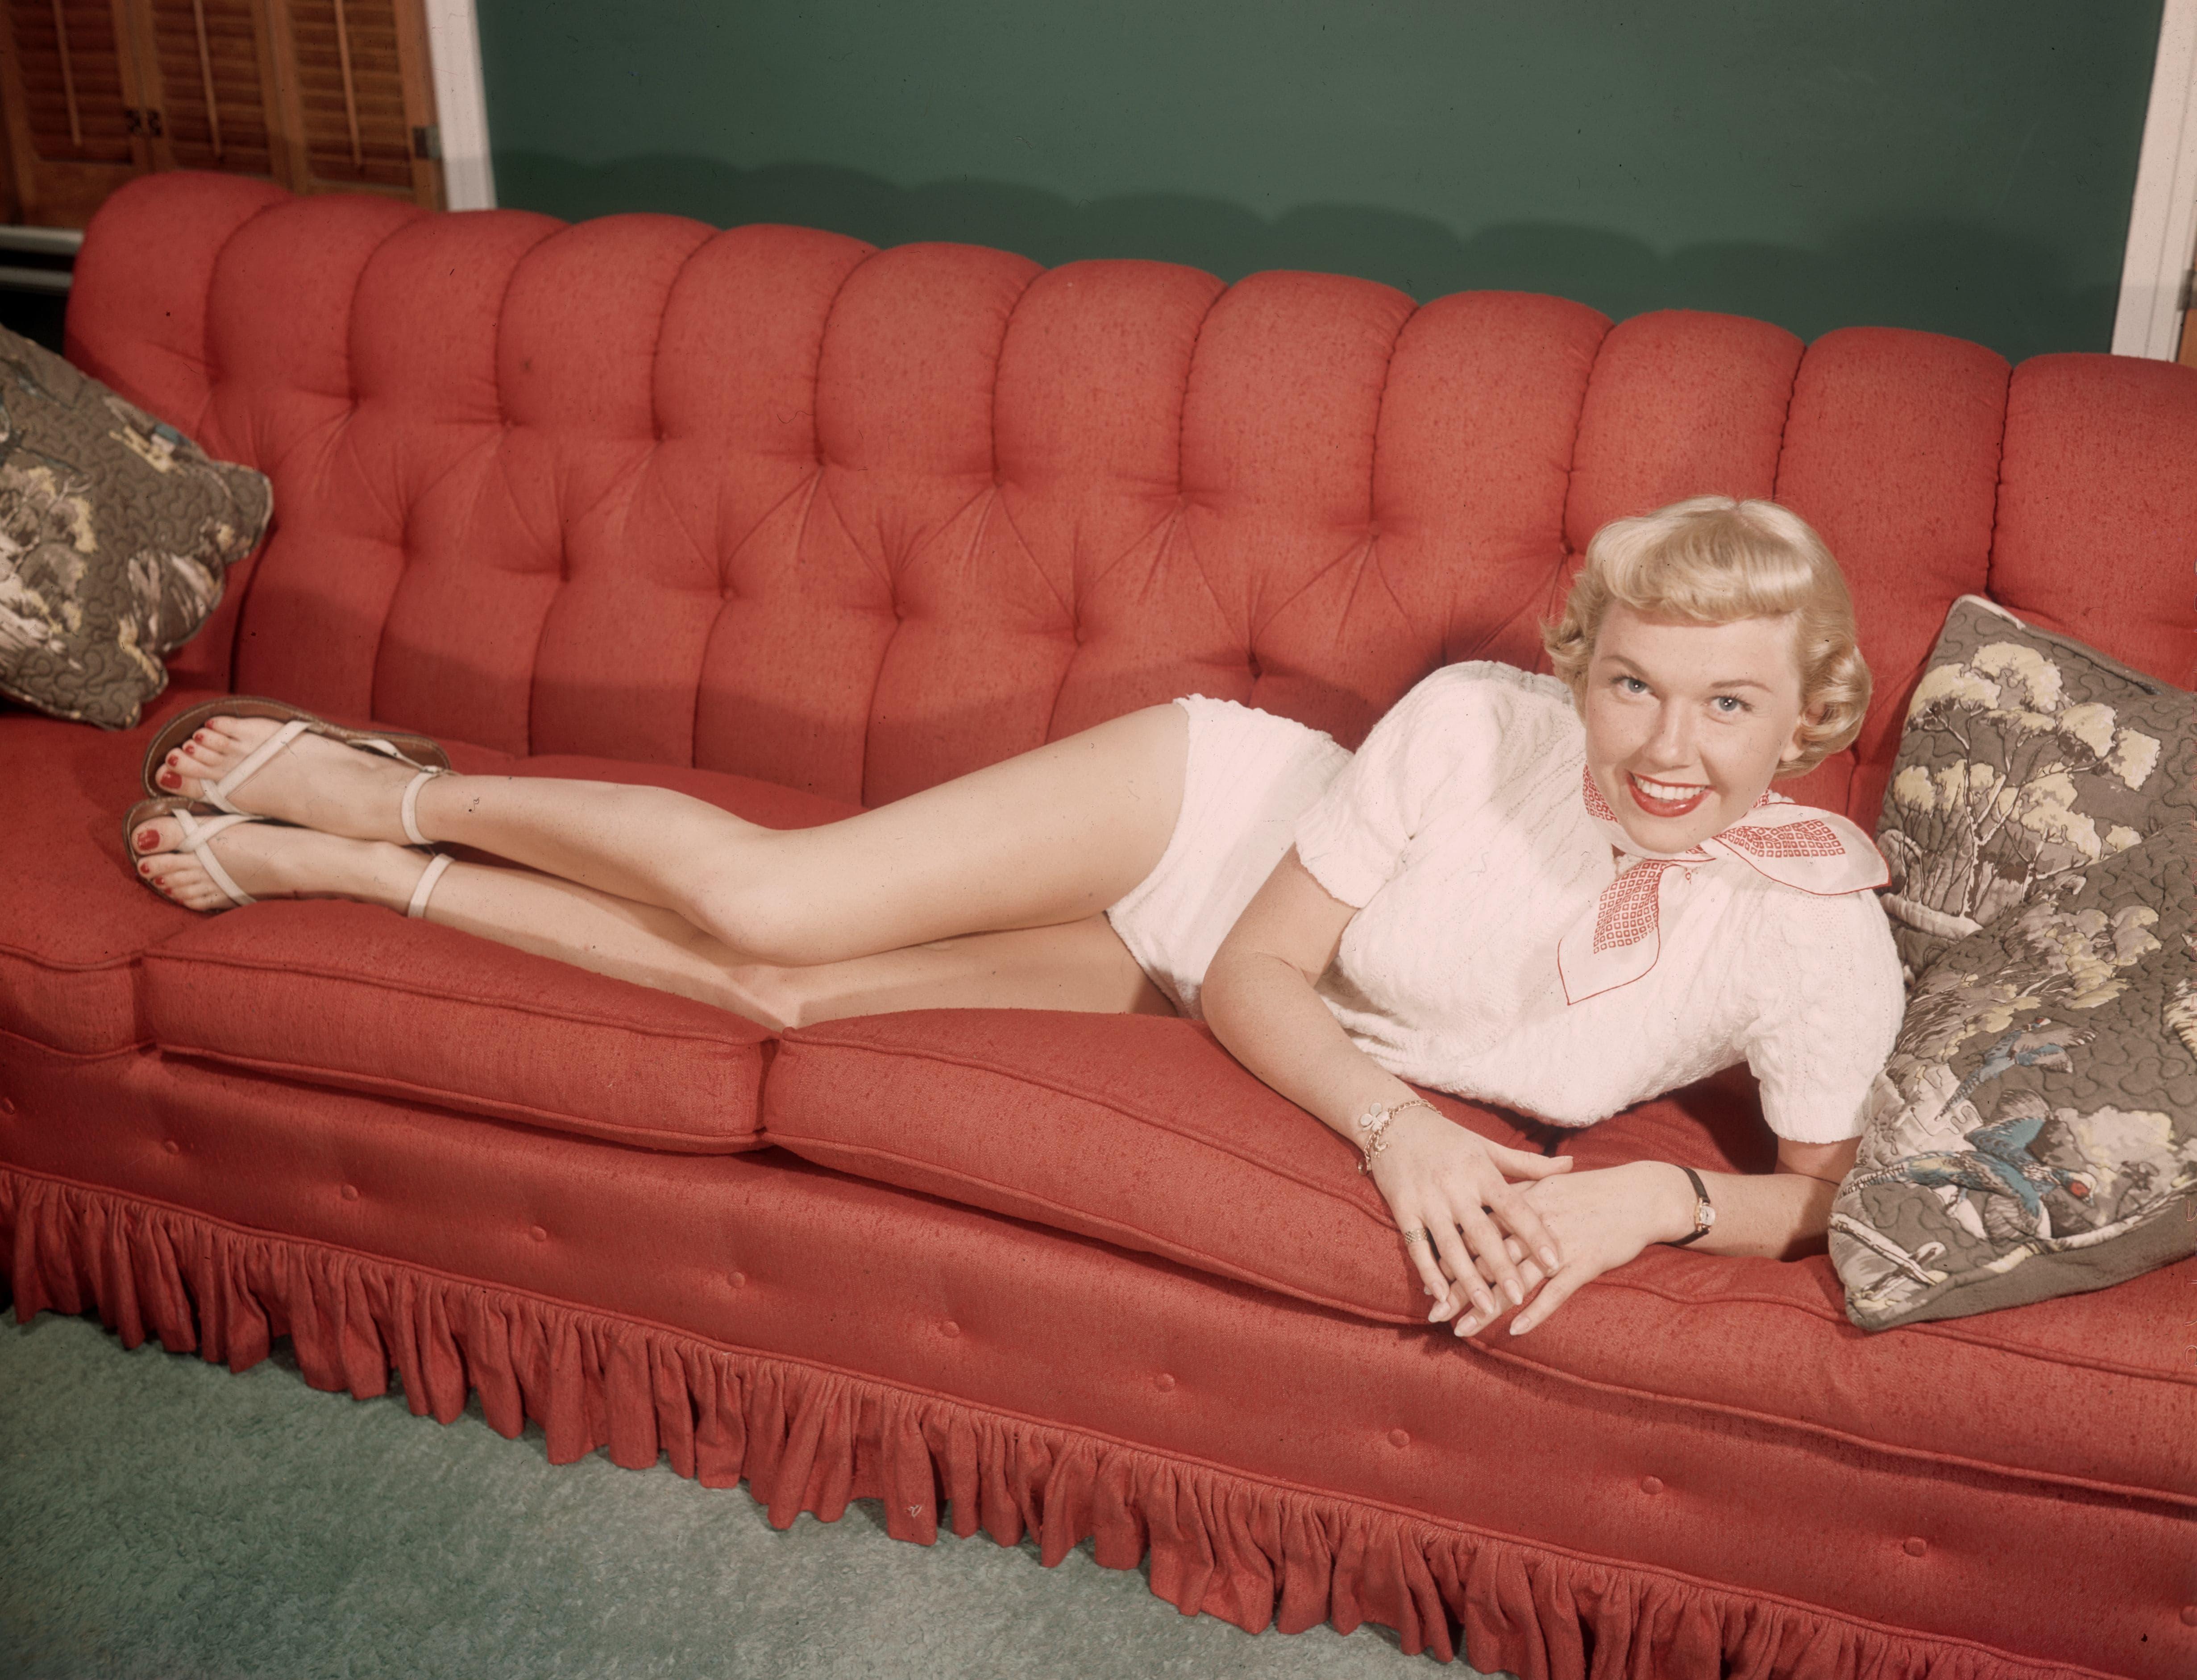 Doris Day Widescreen for desktop